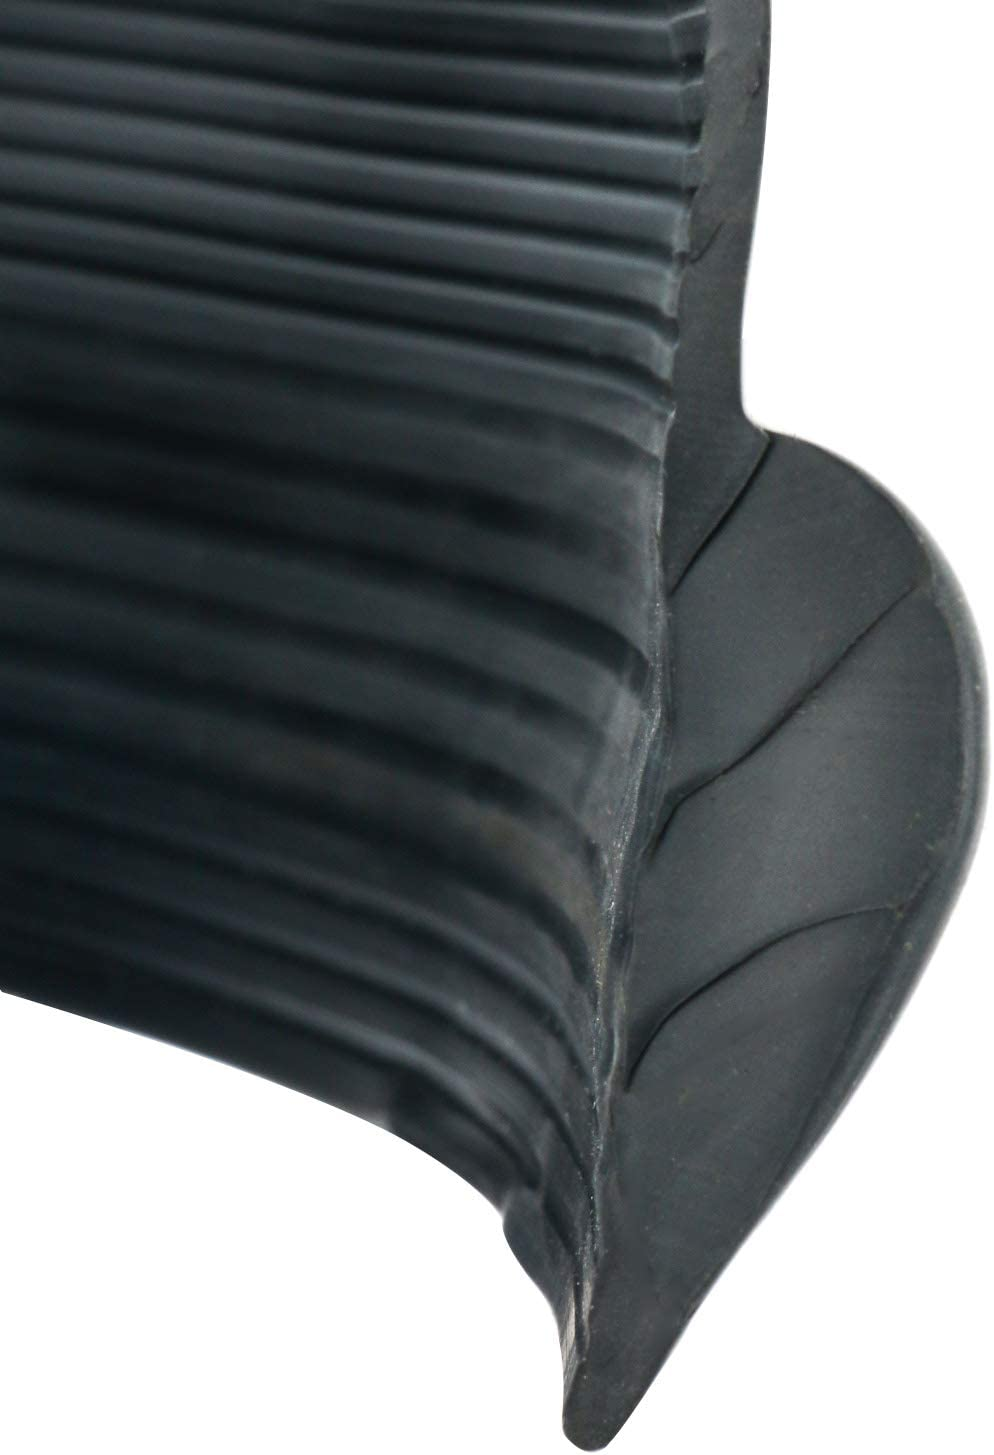 Easy Installation Garage Door Bottom Seal Rubber Weather Stripping Seal Kit 16FT | eBay